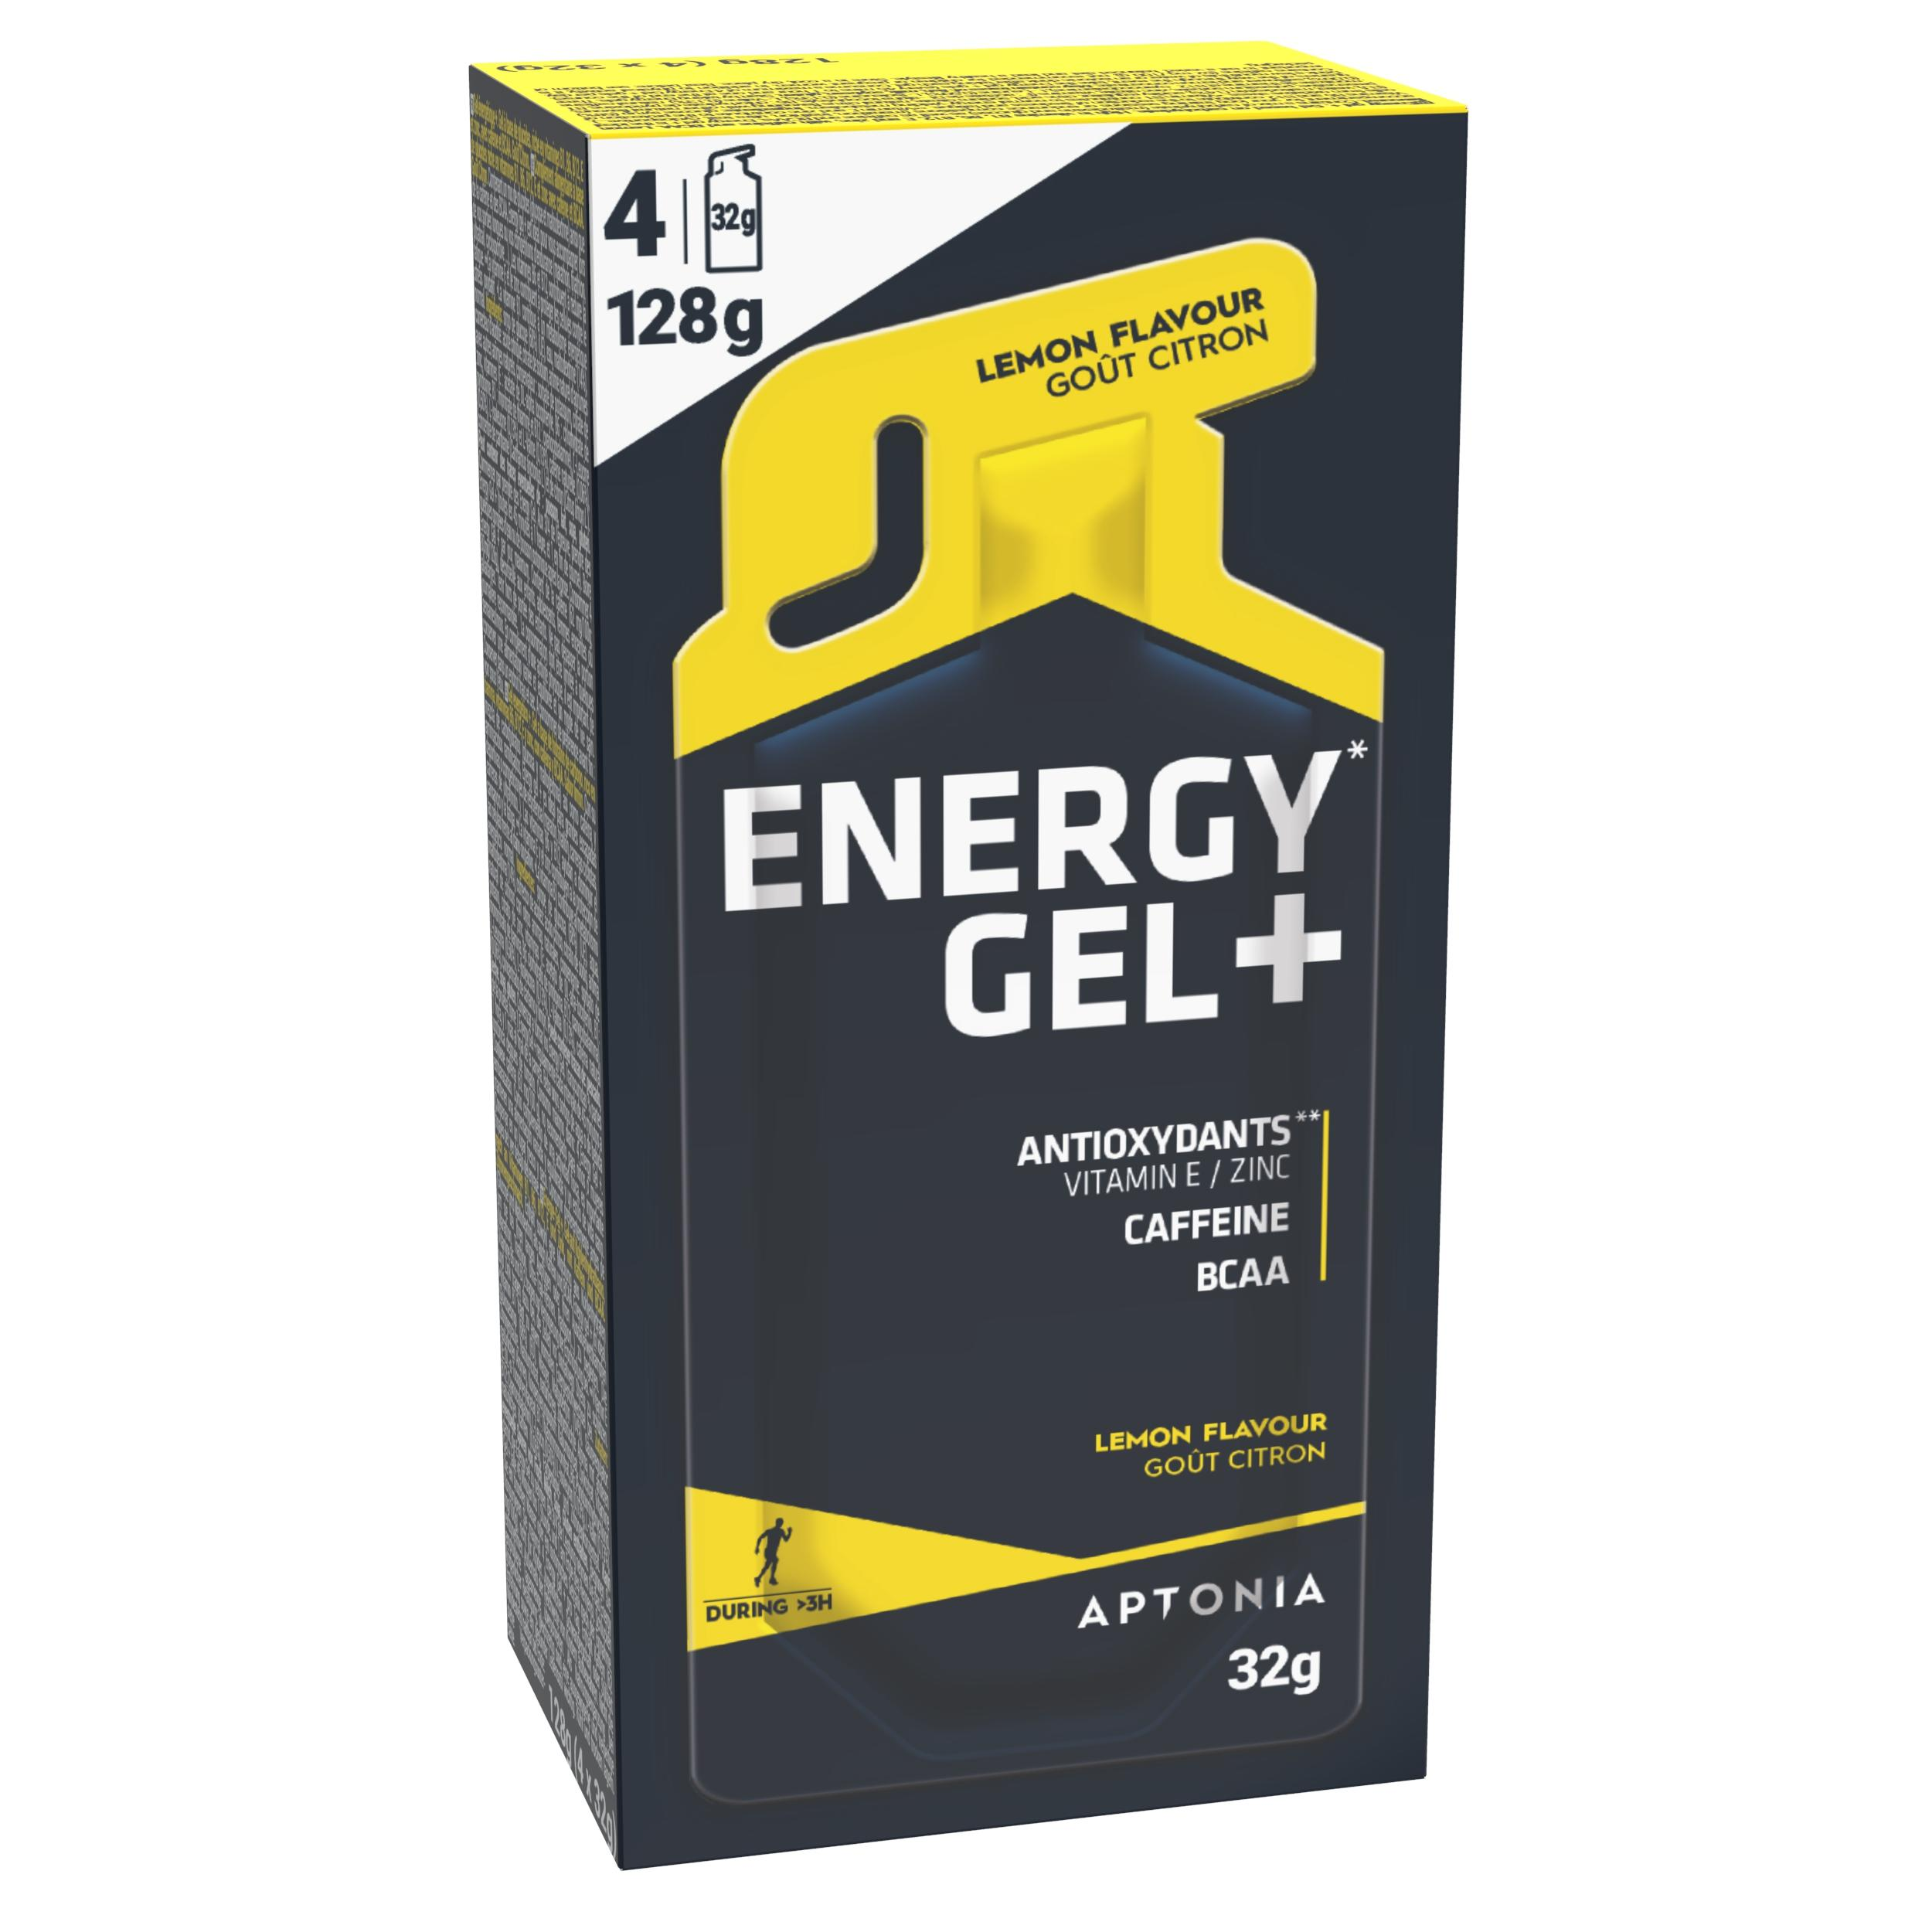 Gel Energy Gel+ Lămâie 4x32g de la APTONIA